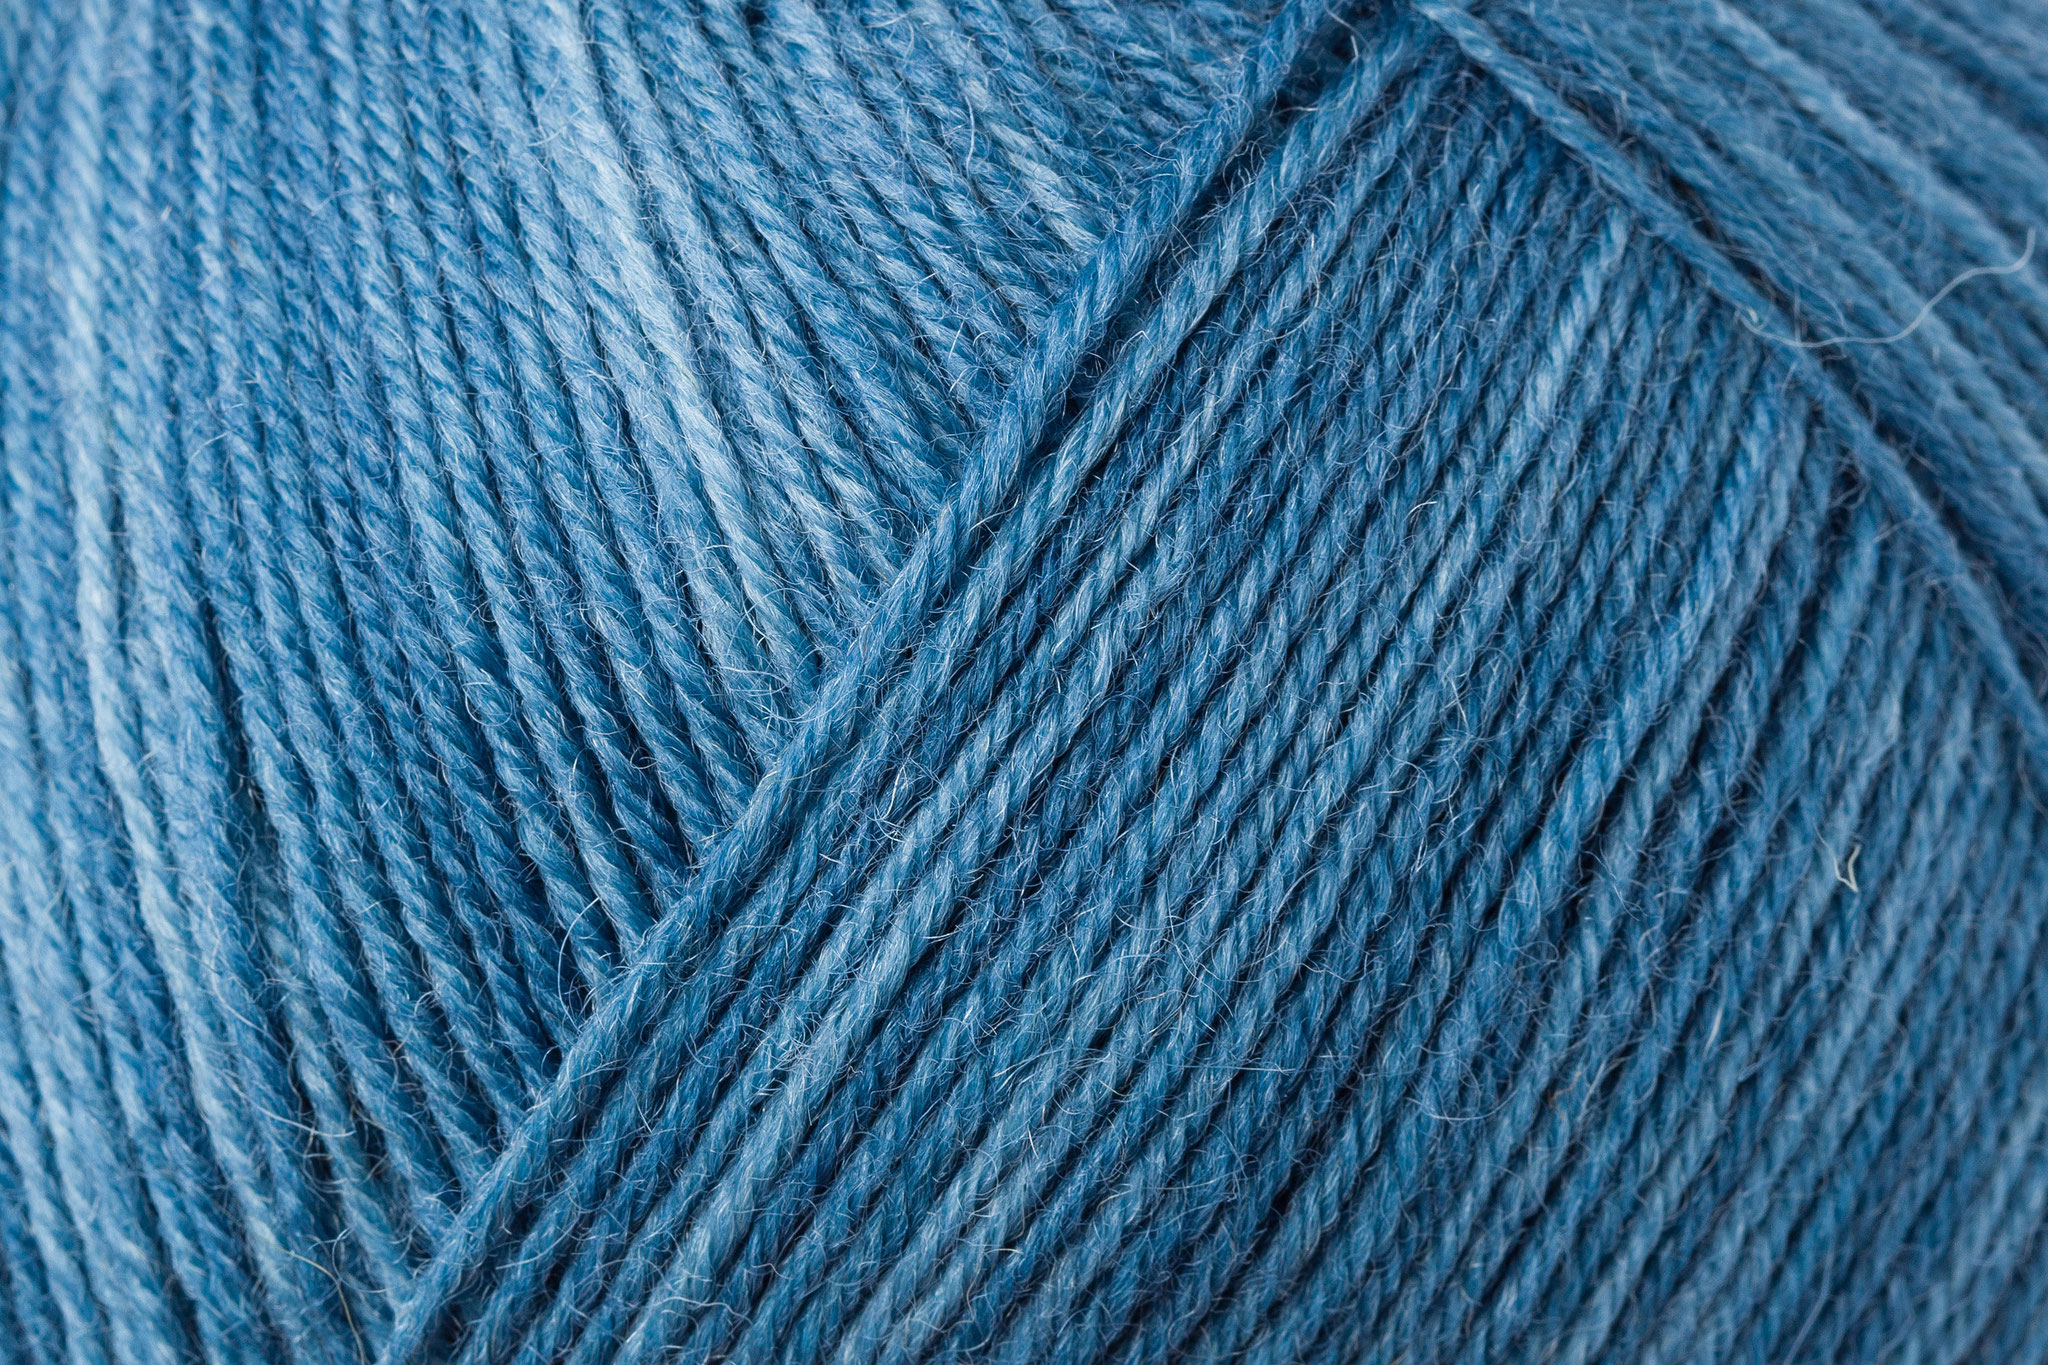 jeansblau color